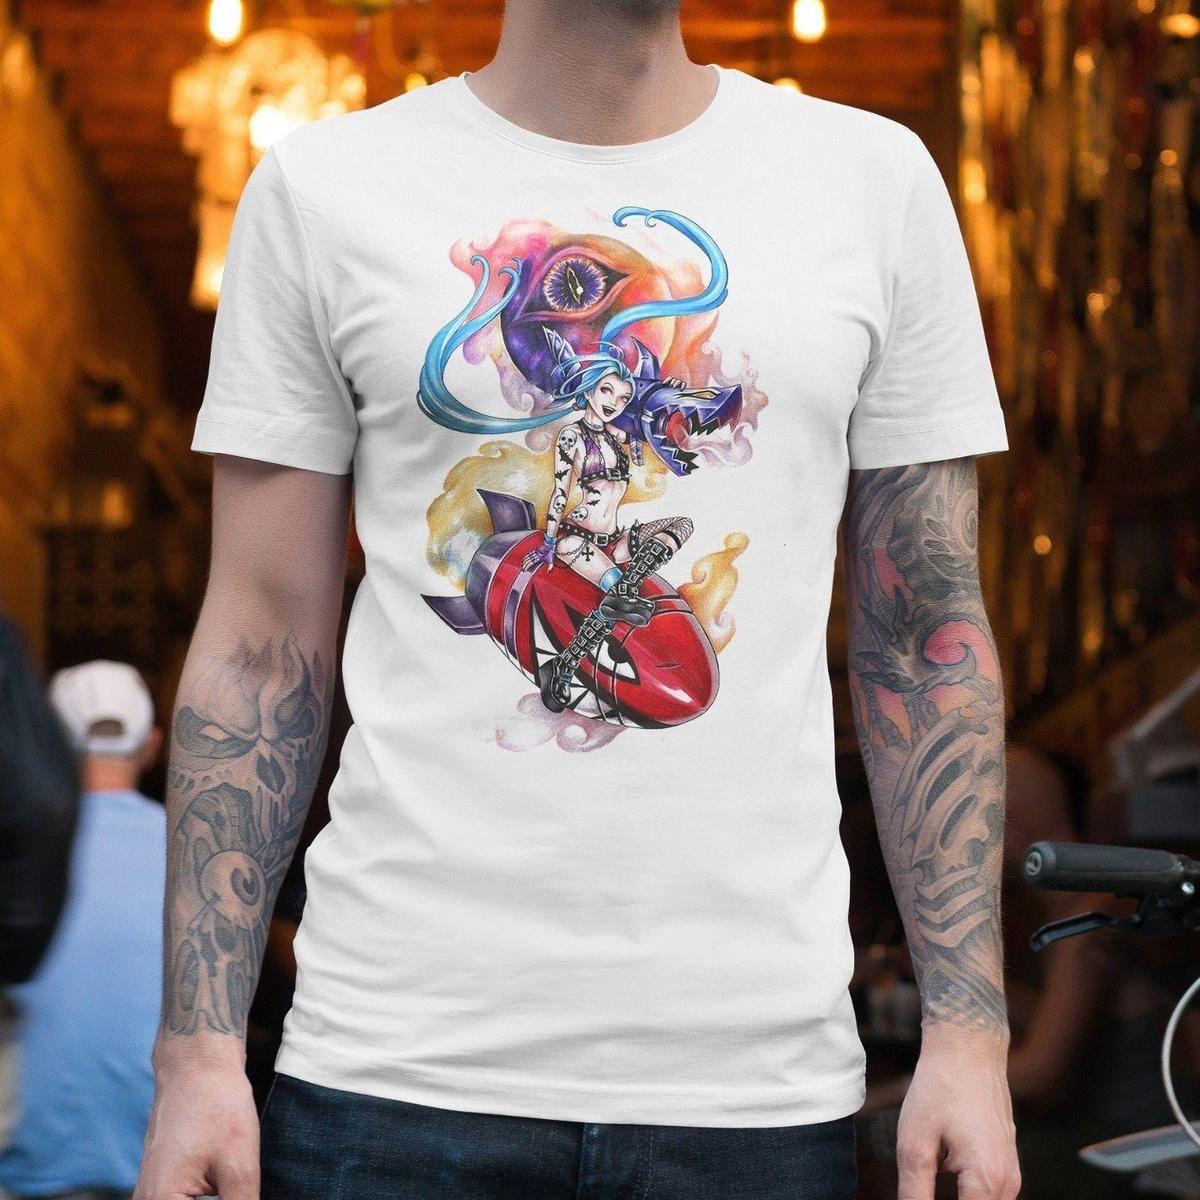 ea7a2ce157 Compre Camiseta De Manga Corta Para Hombre Envío Gratis JINX LOL CAMISETA  UNISEX